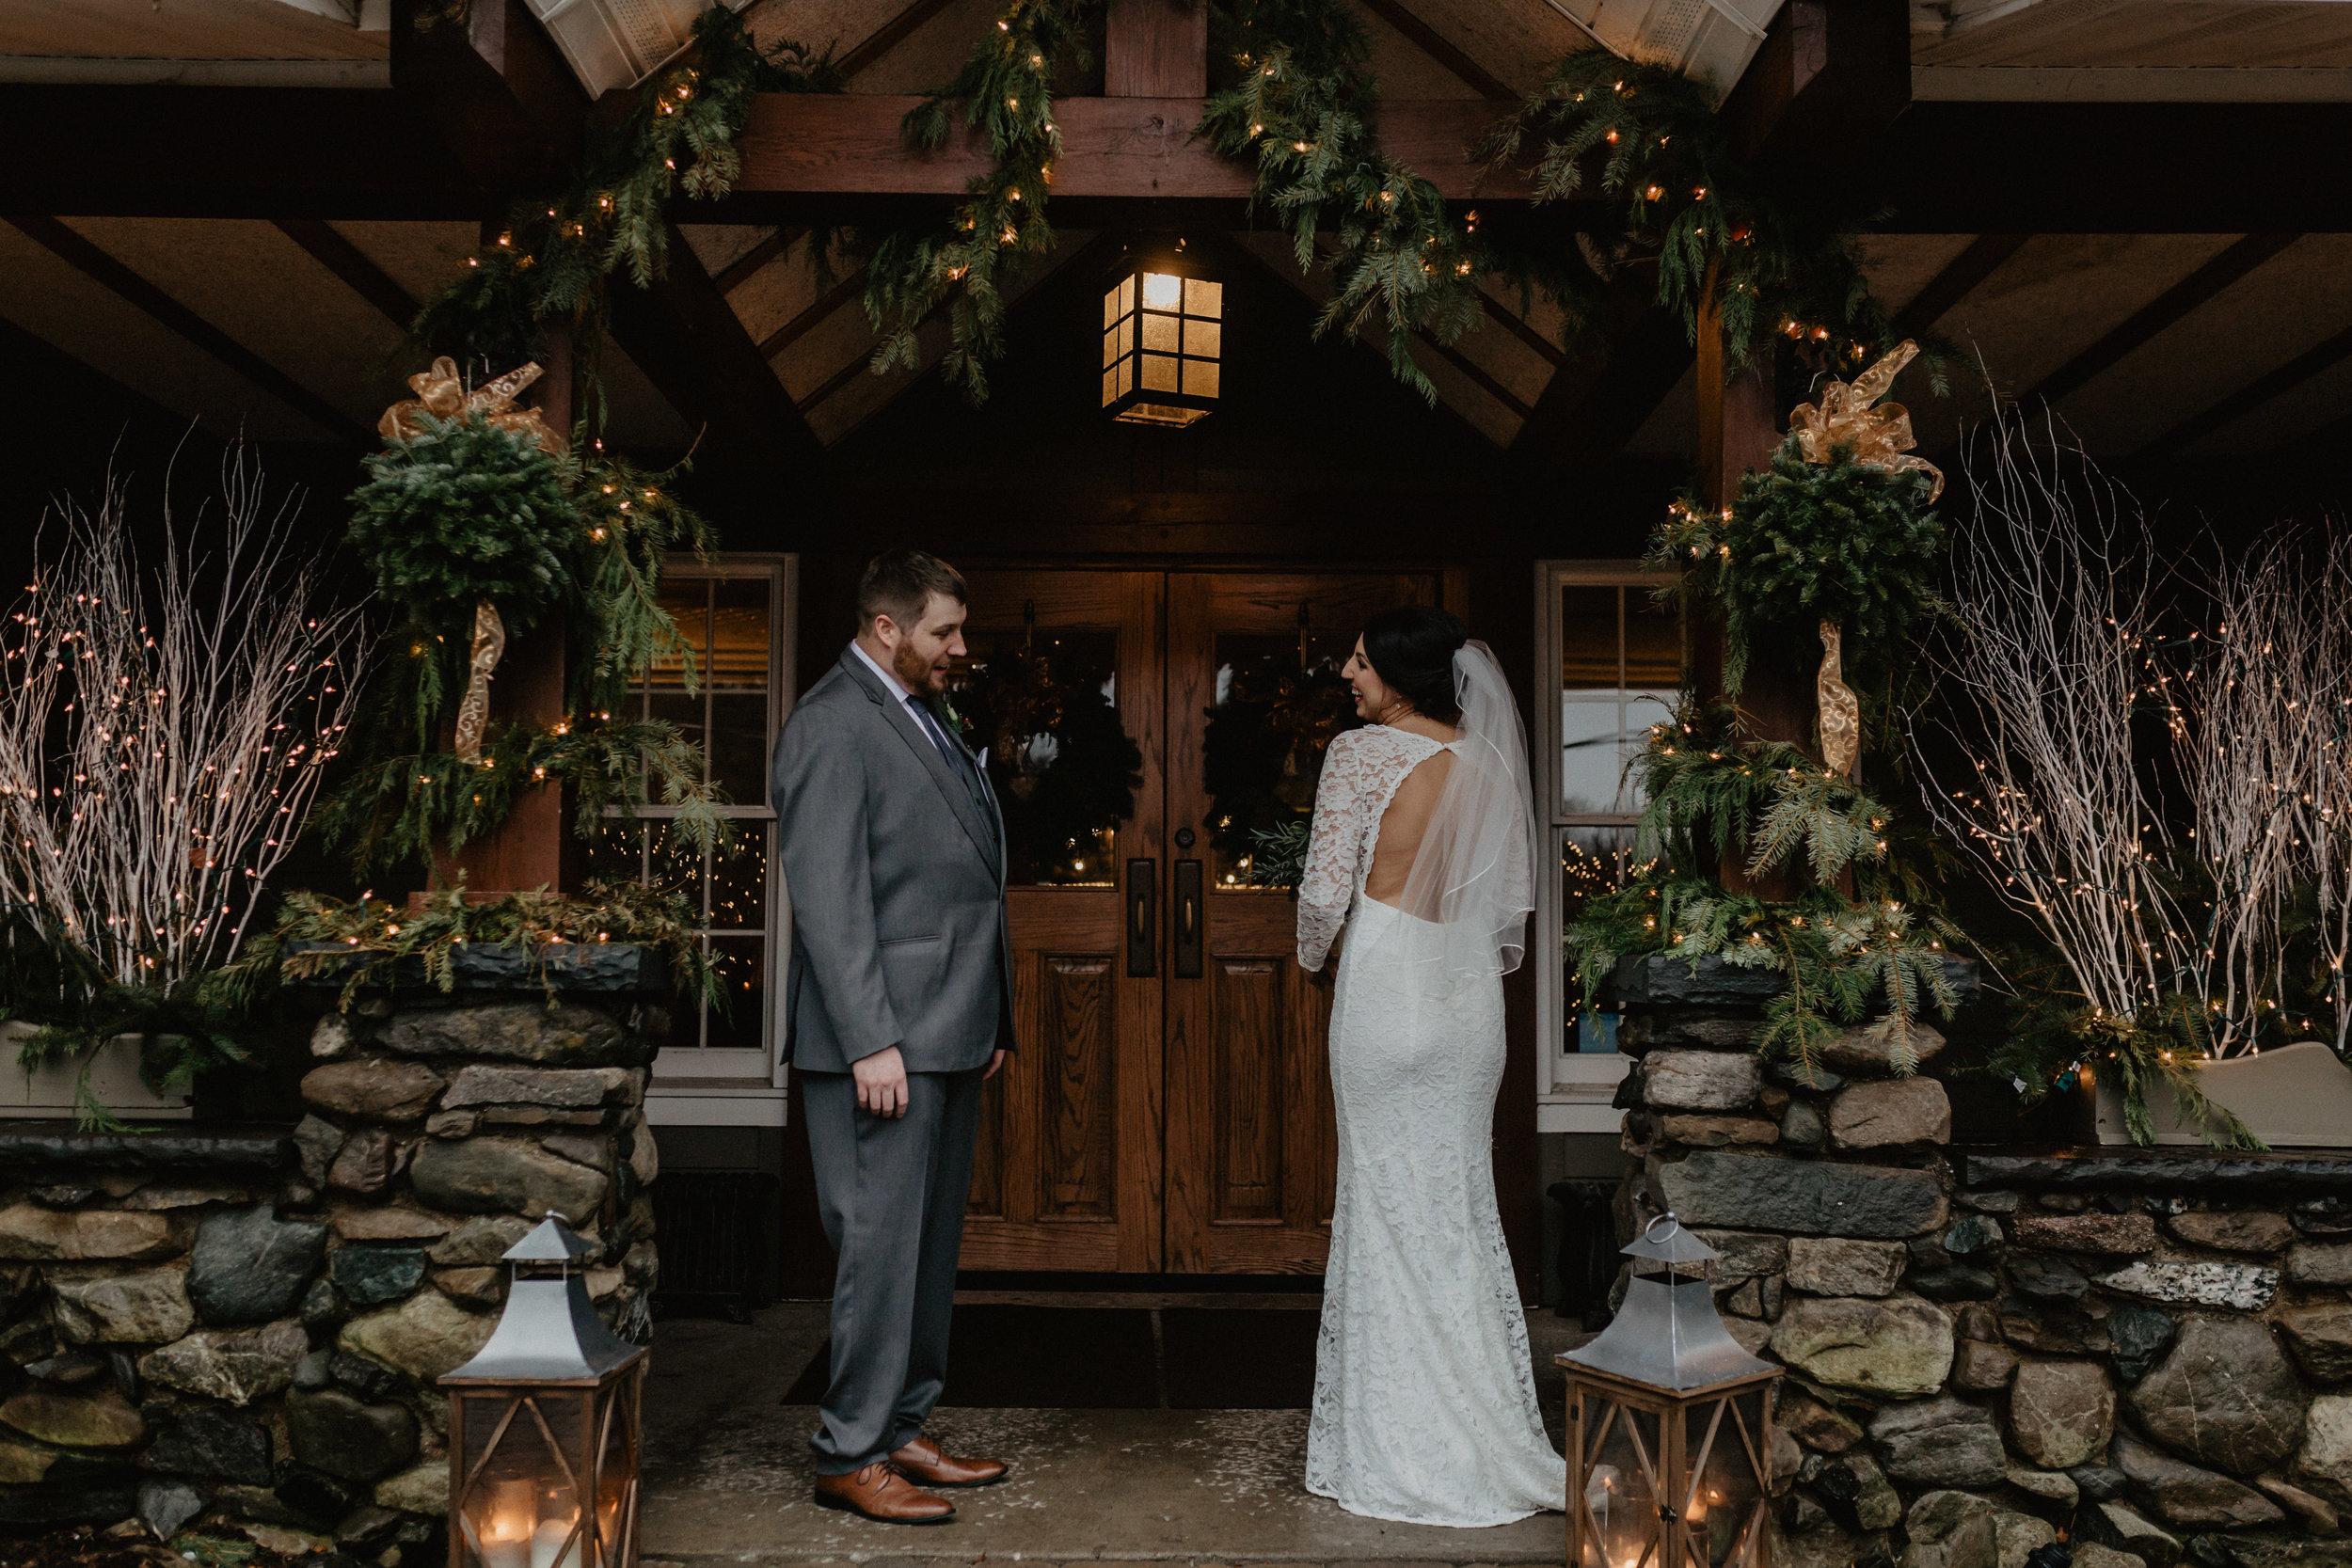 old_daley_on_crooked_lake_wedding_029.jpg